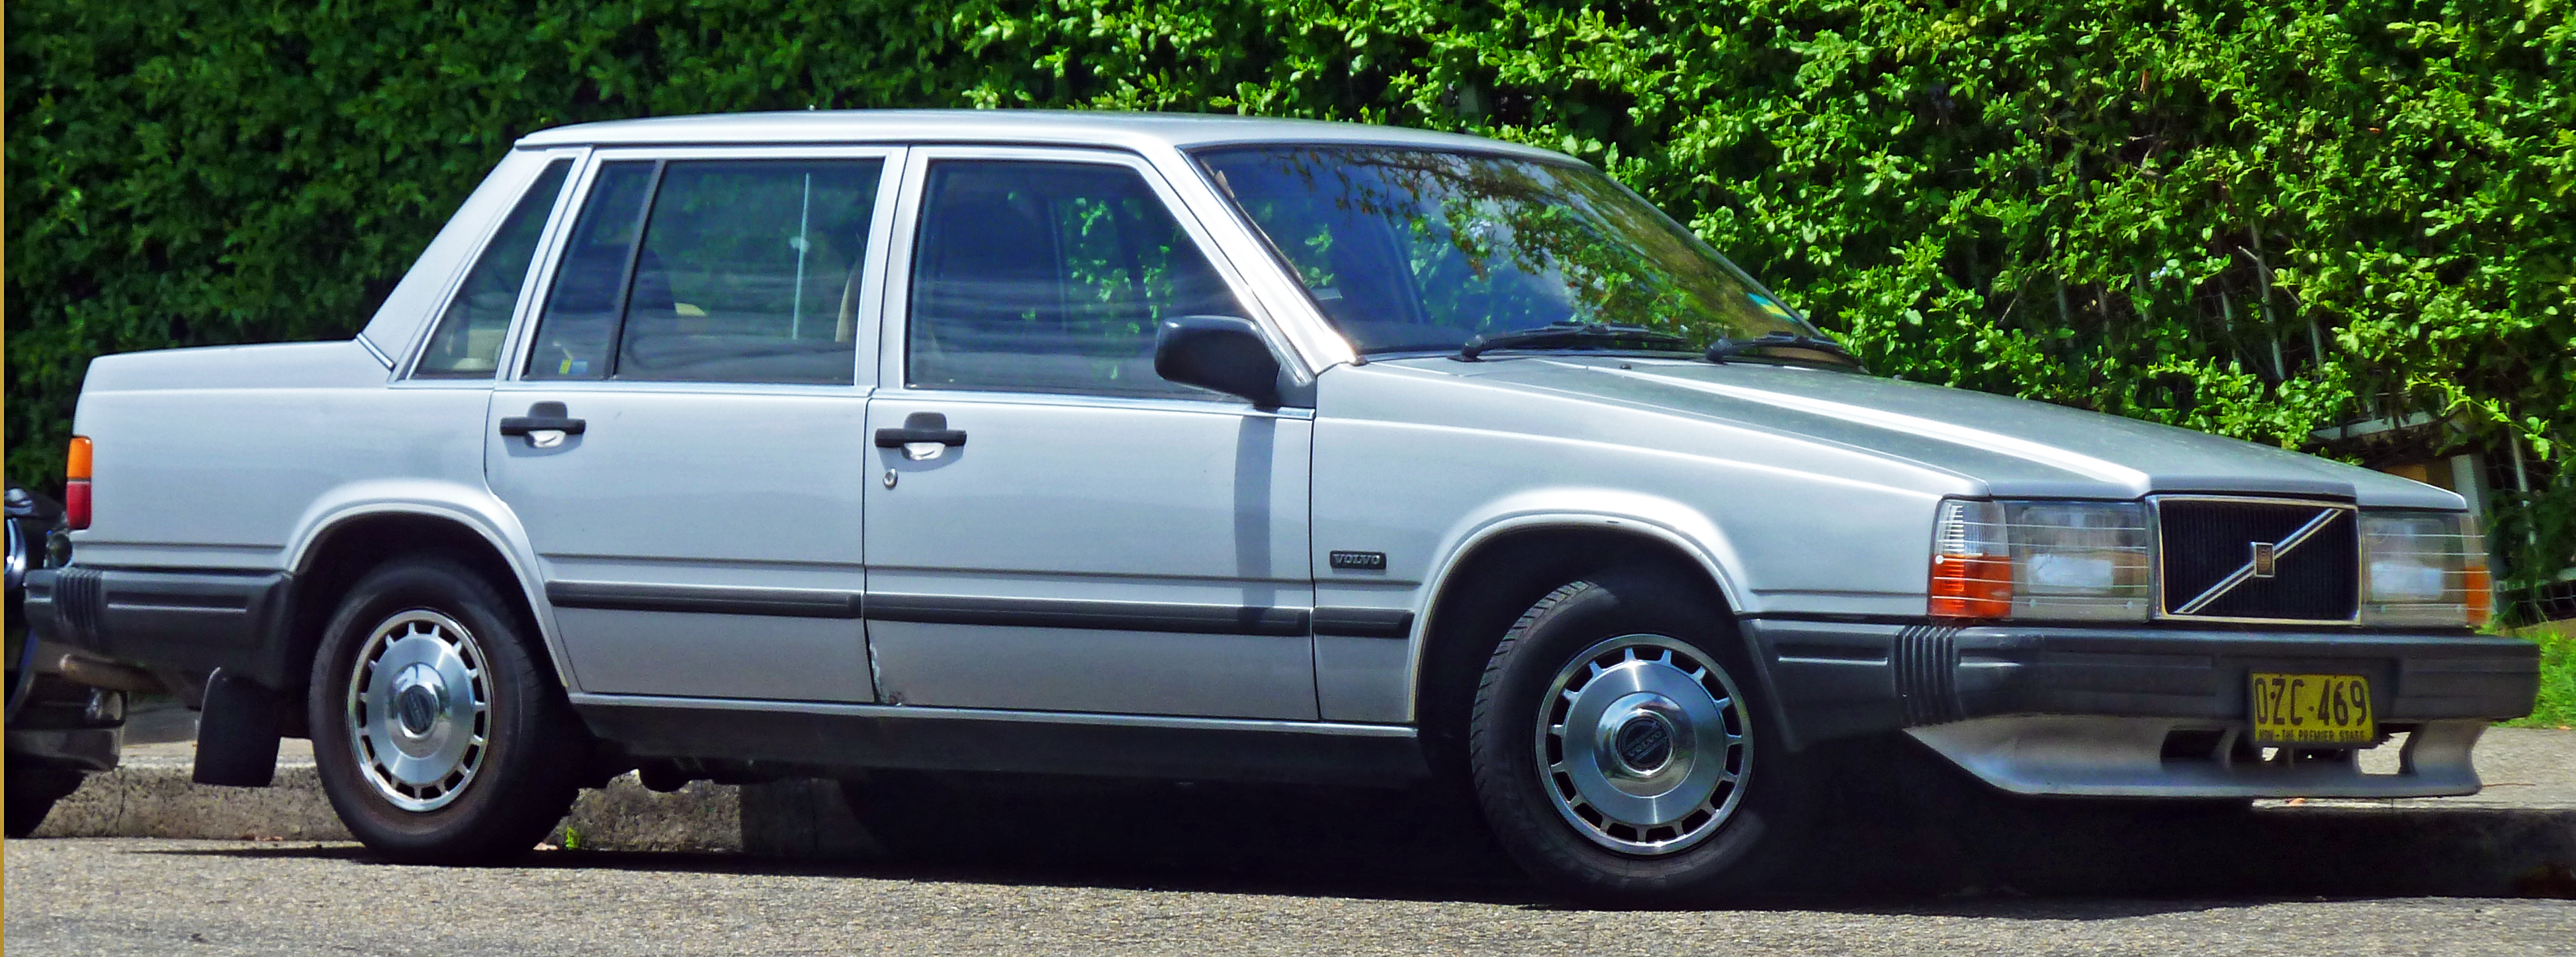 File 1985-1989 Volvo 740 Gl Sedan  2011-01-12  Jpg